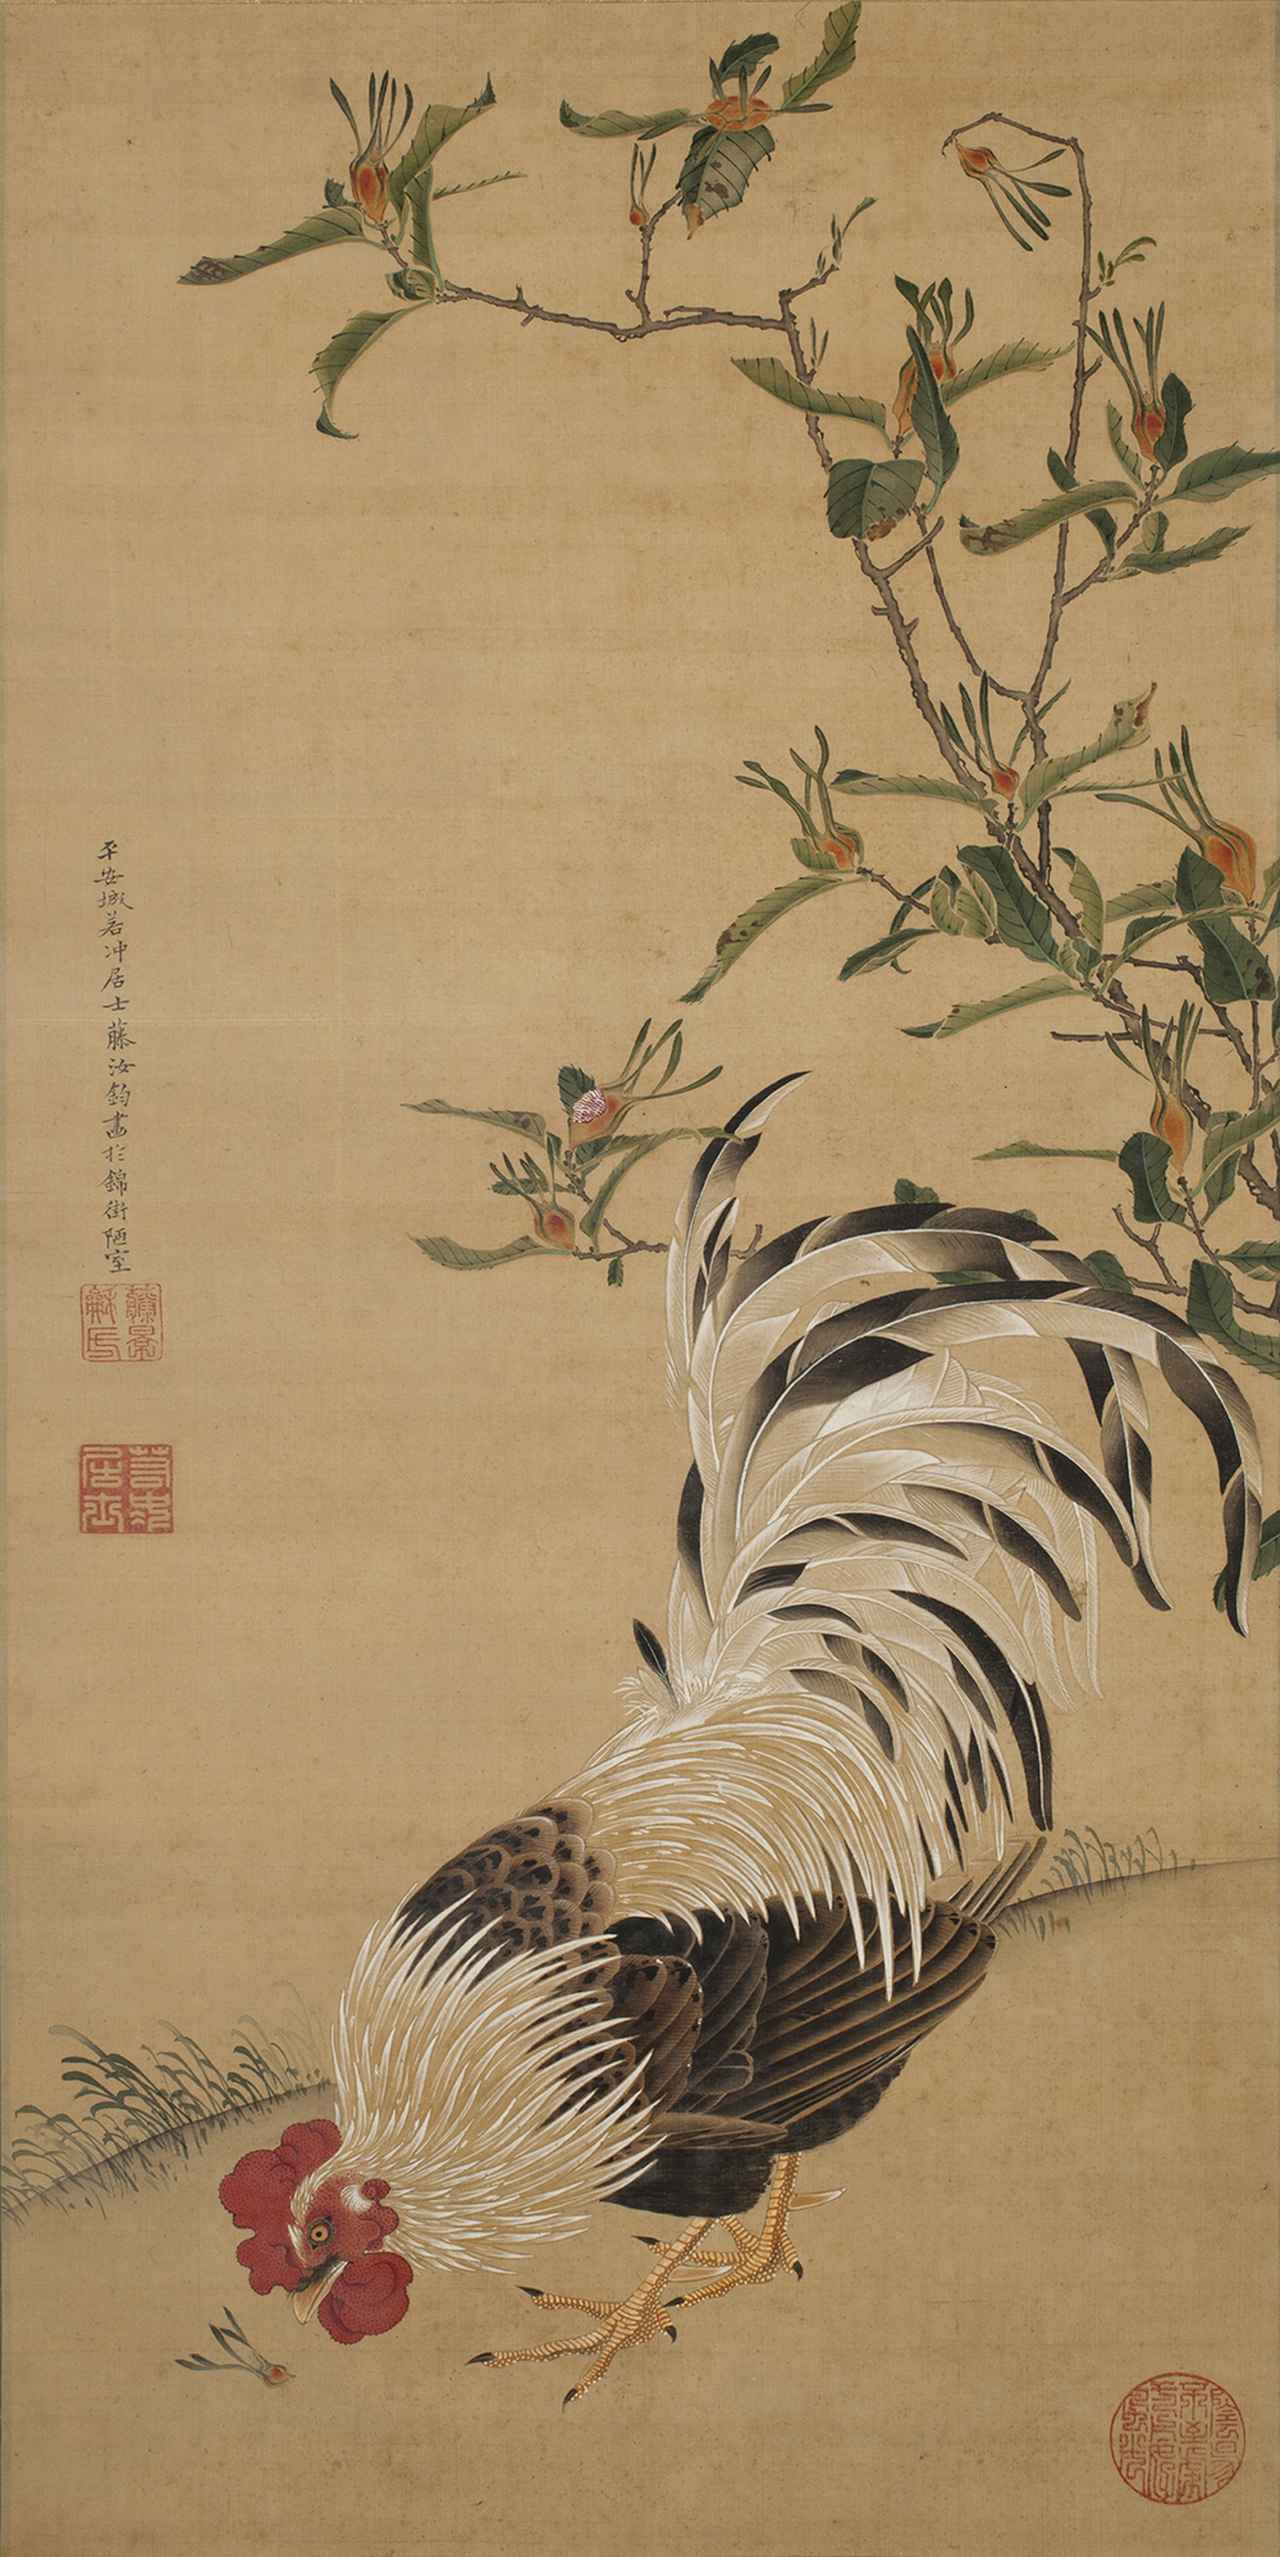 Images : 伊藤若冲 《梔子雄鶏図》